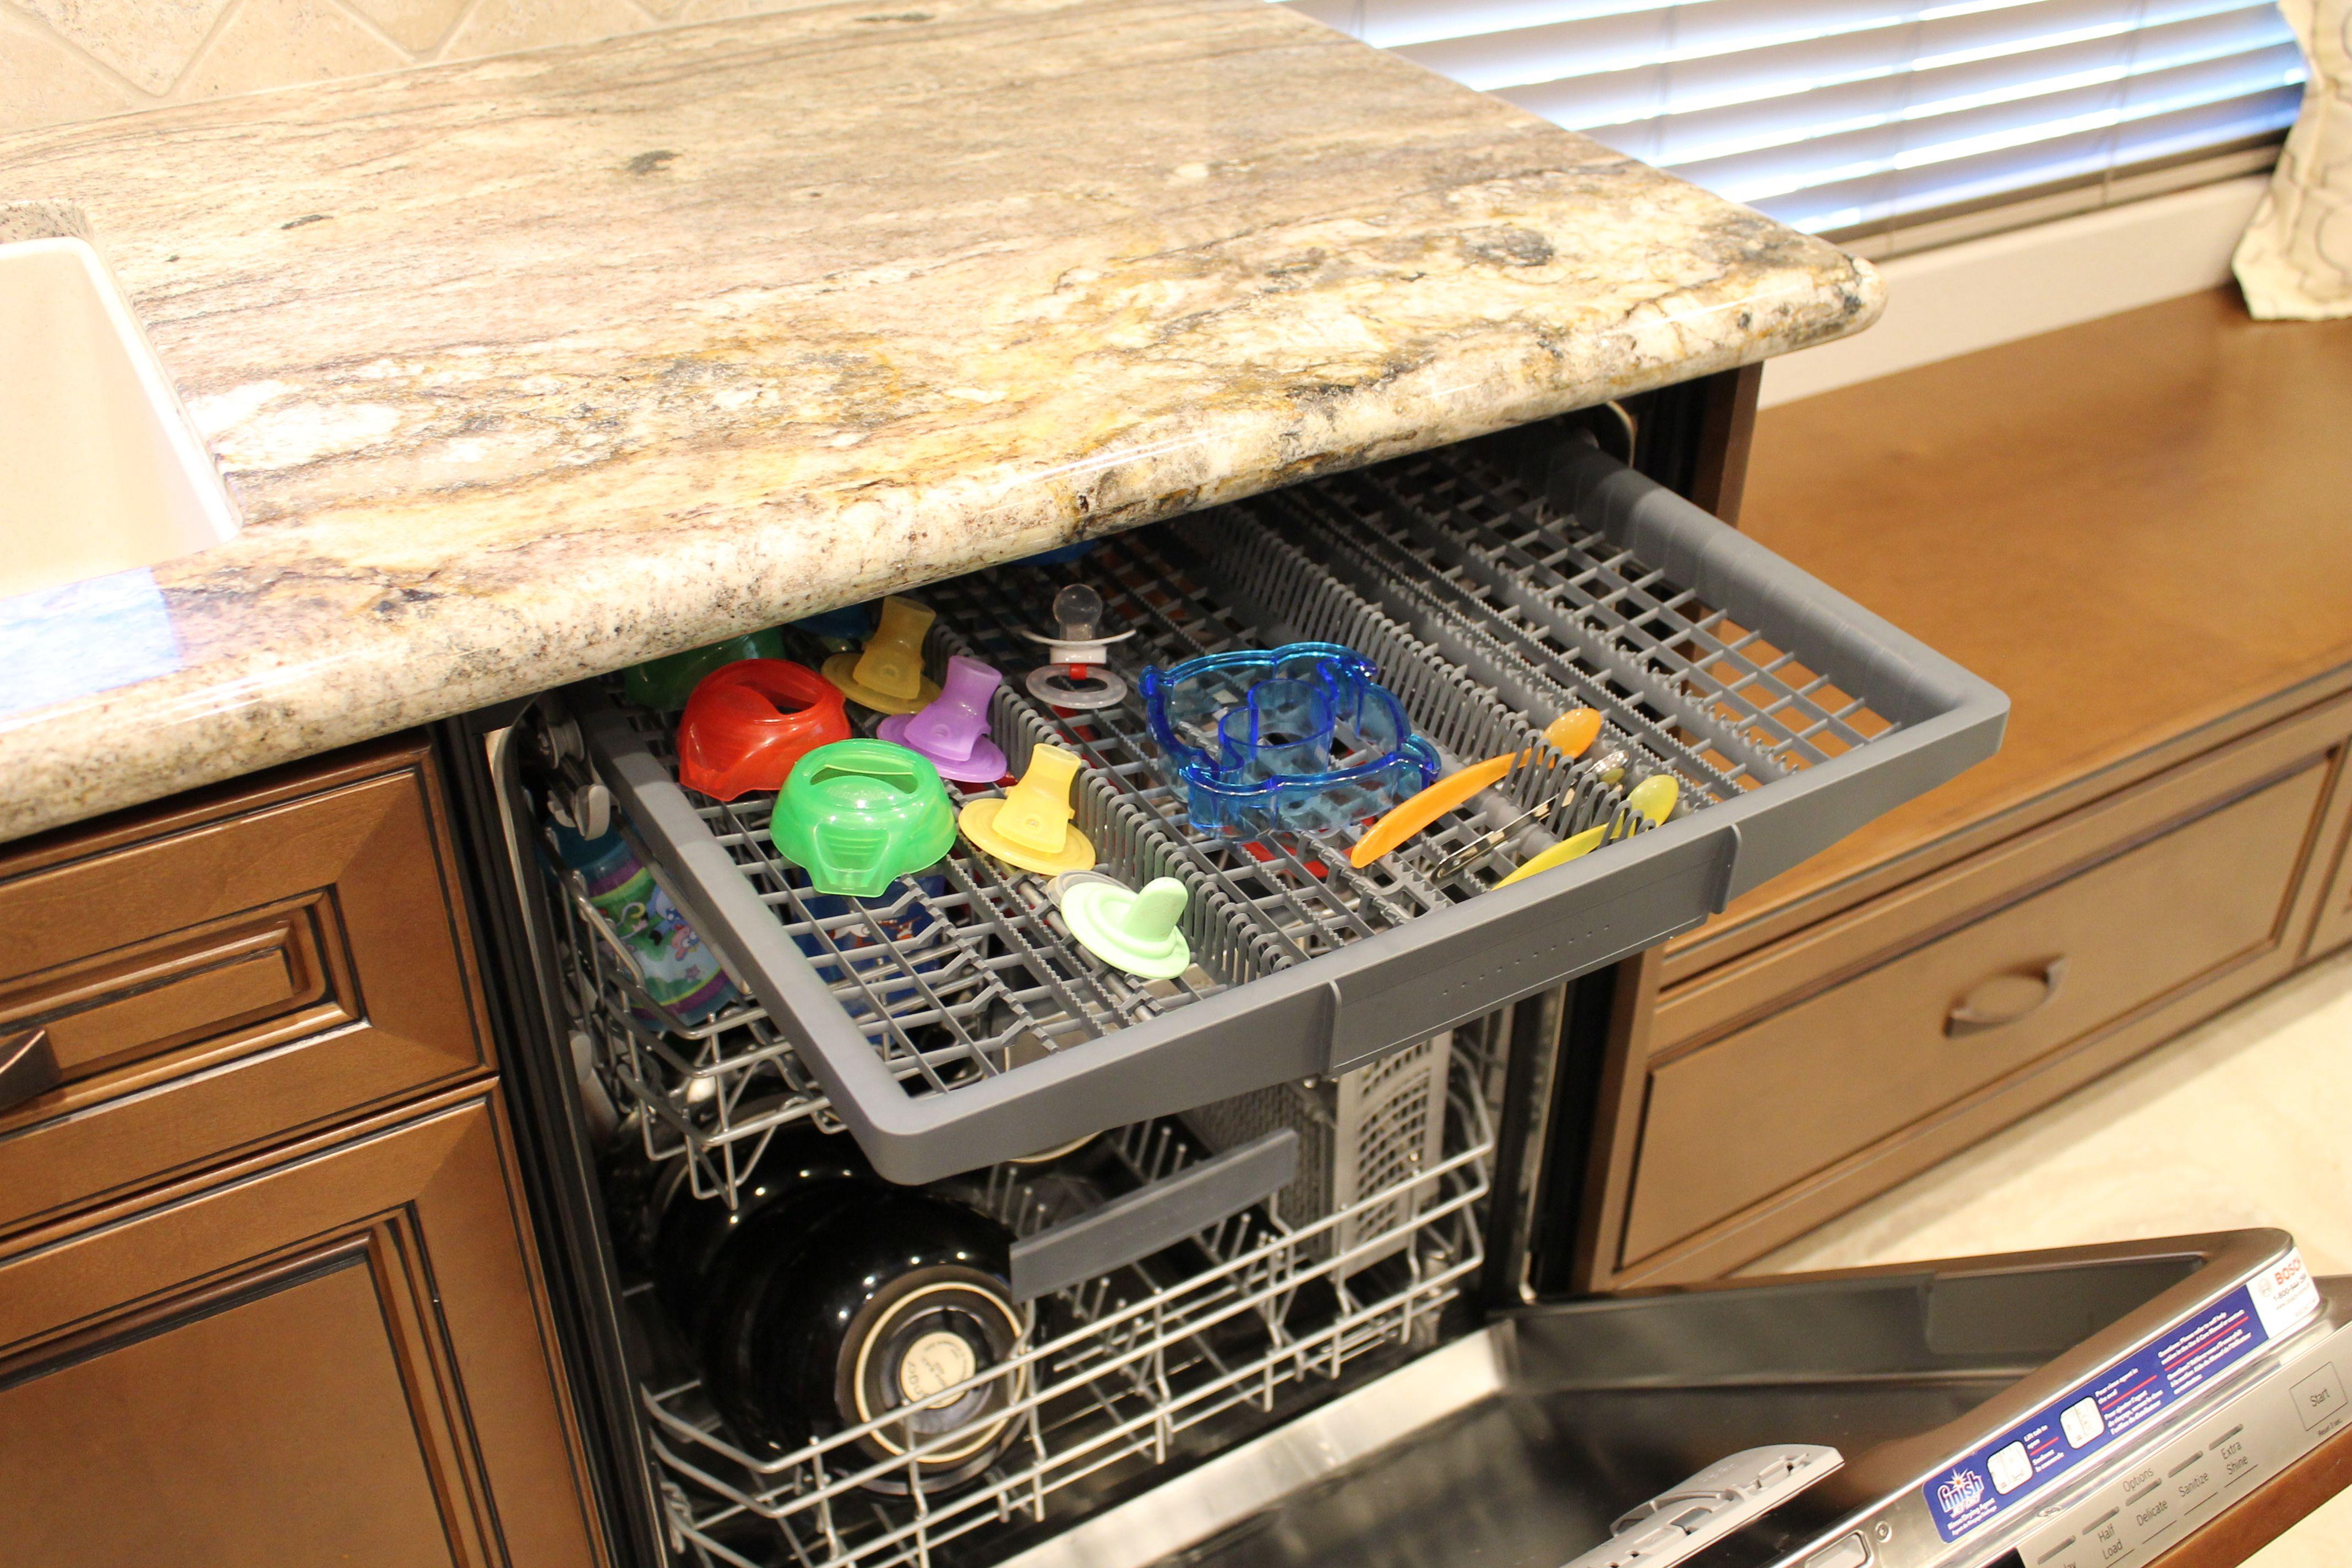 Bosch Dishwasher 800 Series Panel Ready Dwith 3rd Rack And San Luiz Granite Counter Bosch Dishwasher 800 Bosch Dishwashers Granite Counters